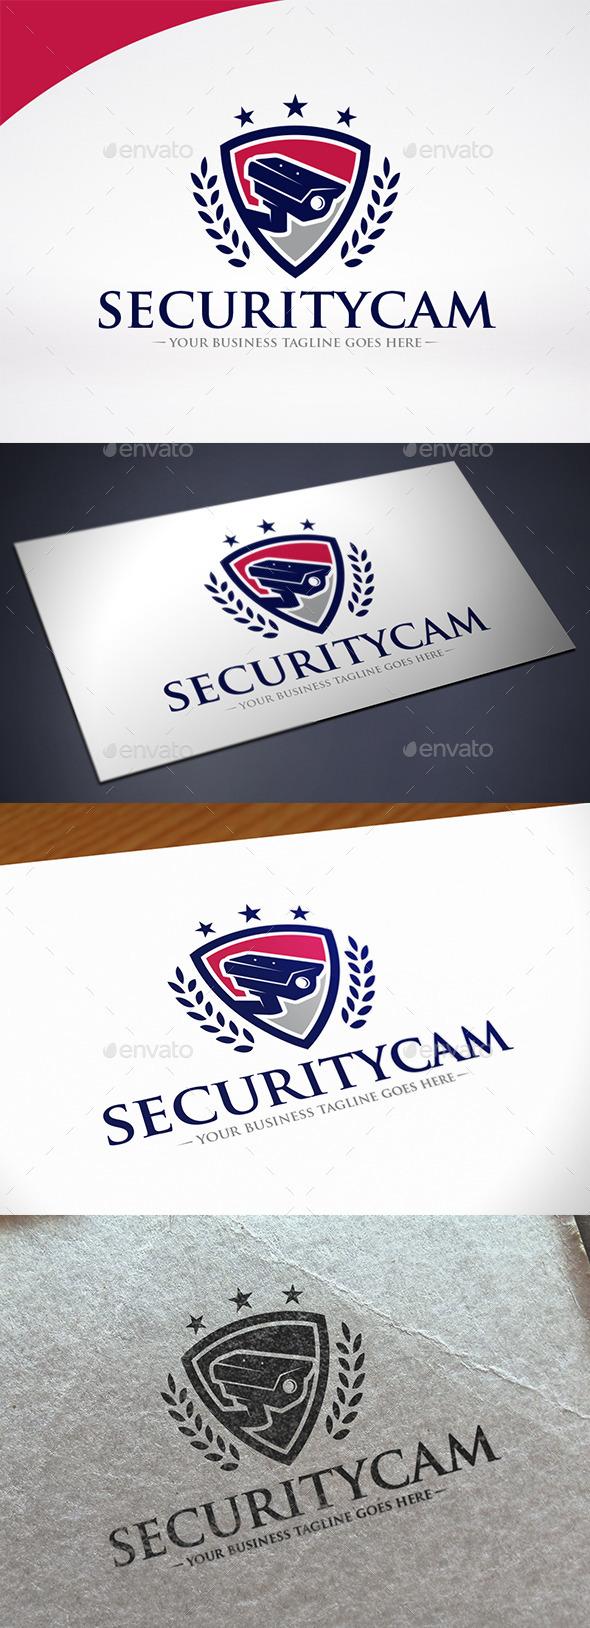 Security Camera Logo